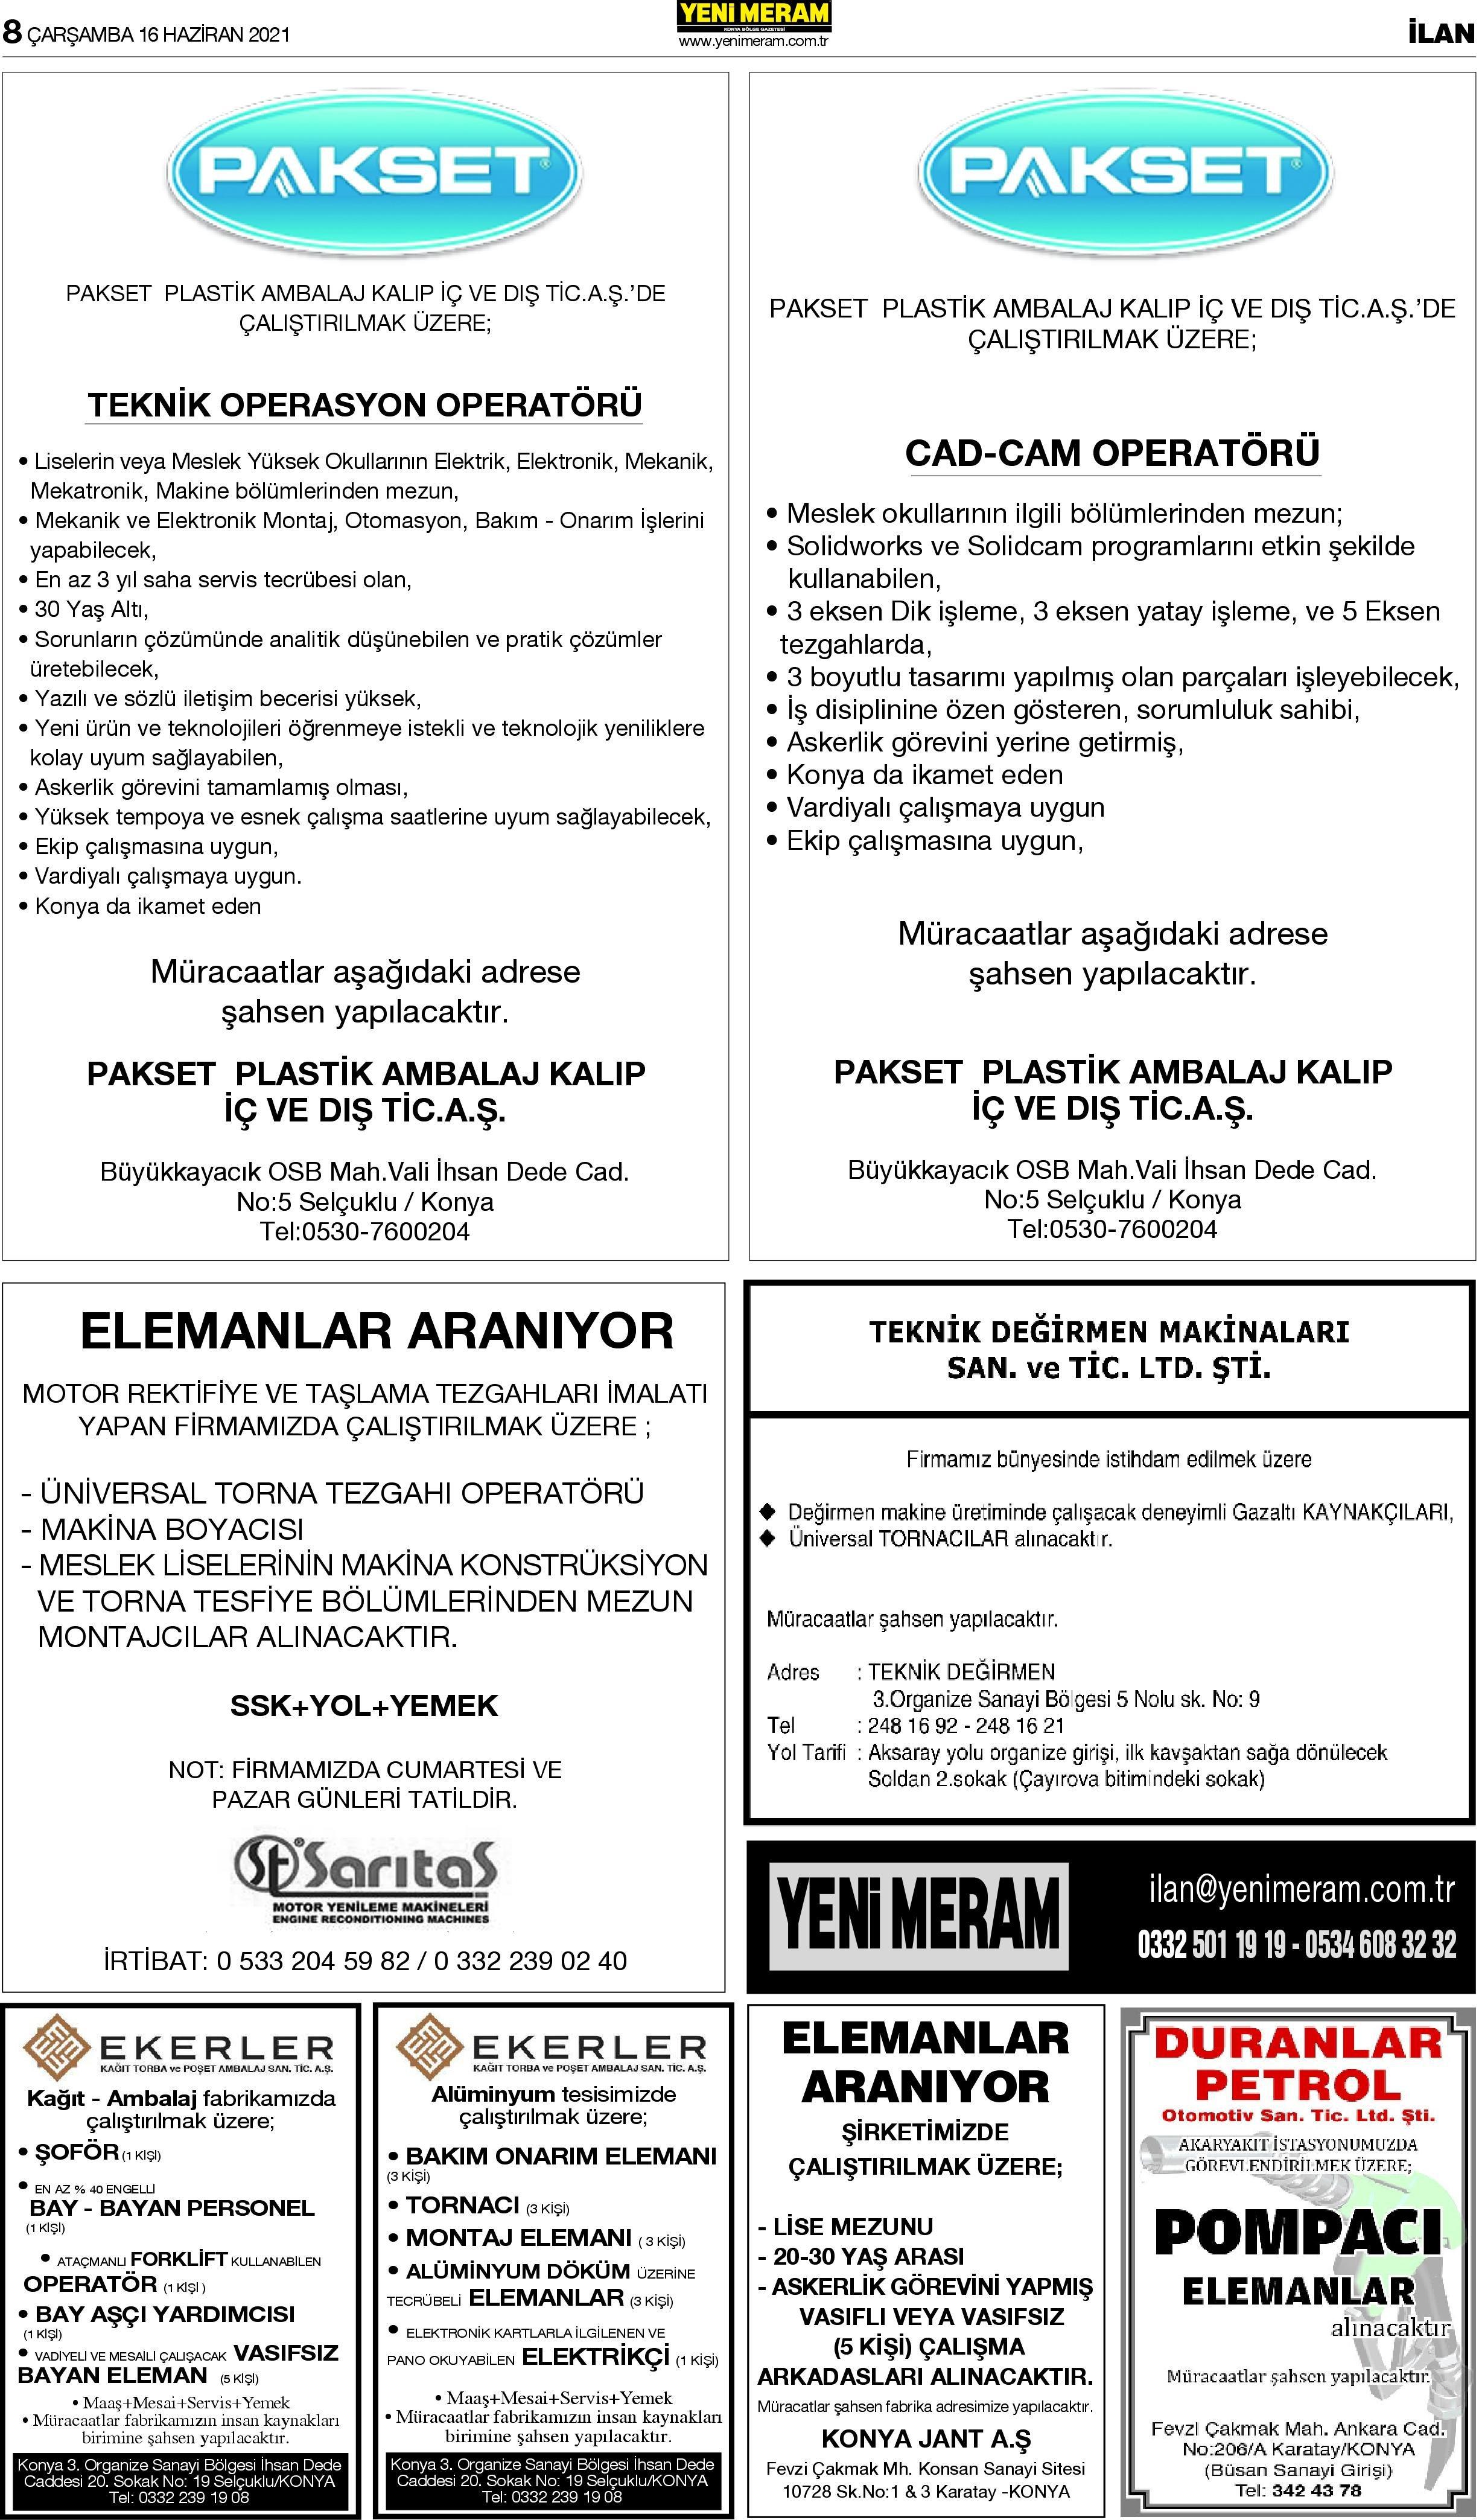 16 Haziran 2021 Yeni Meram Gazetesi